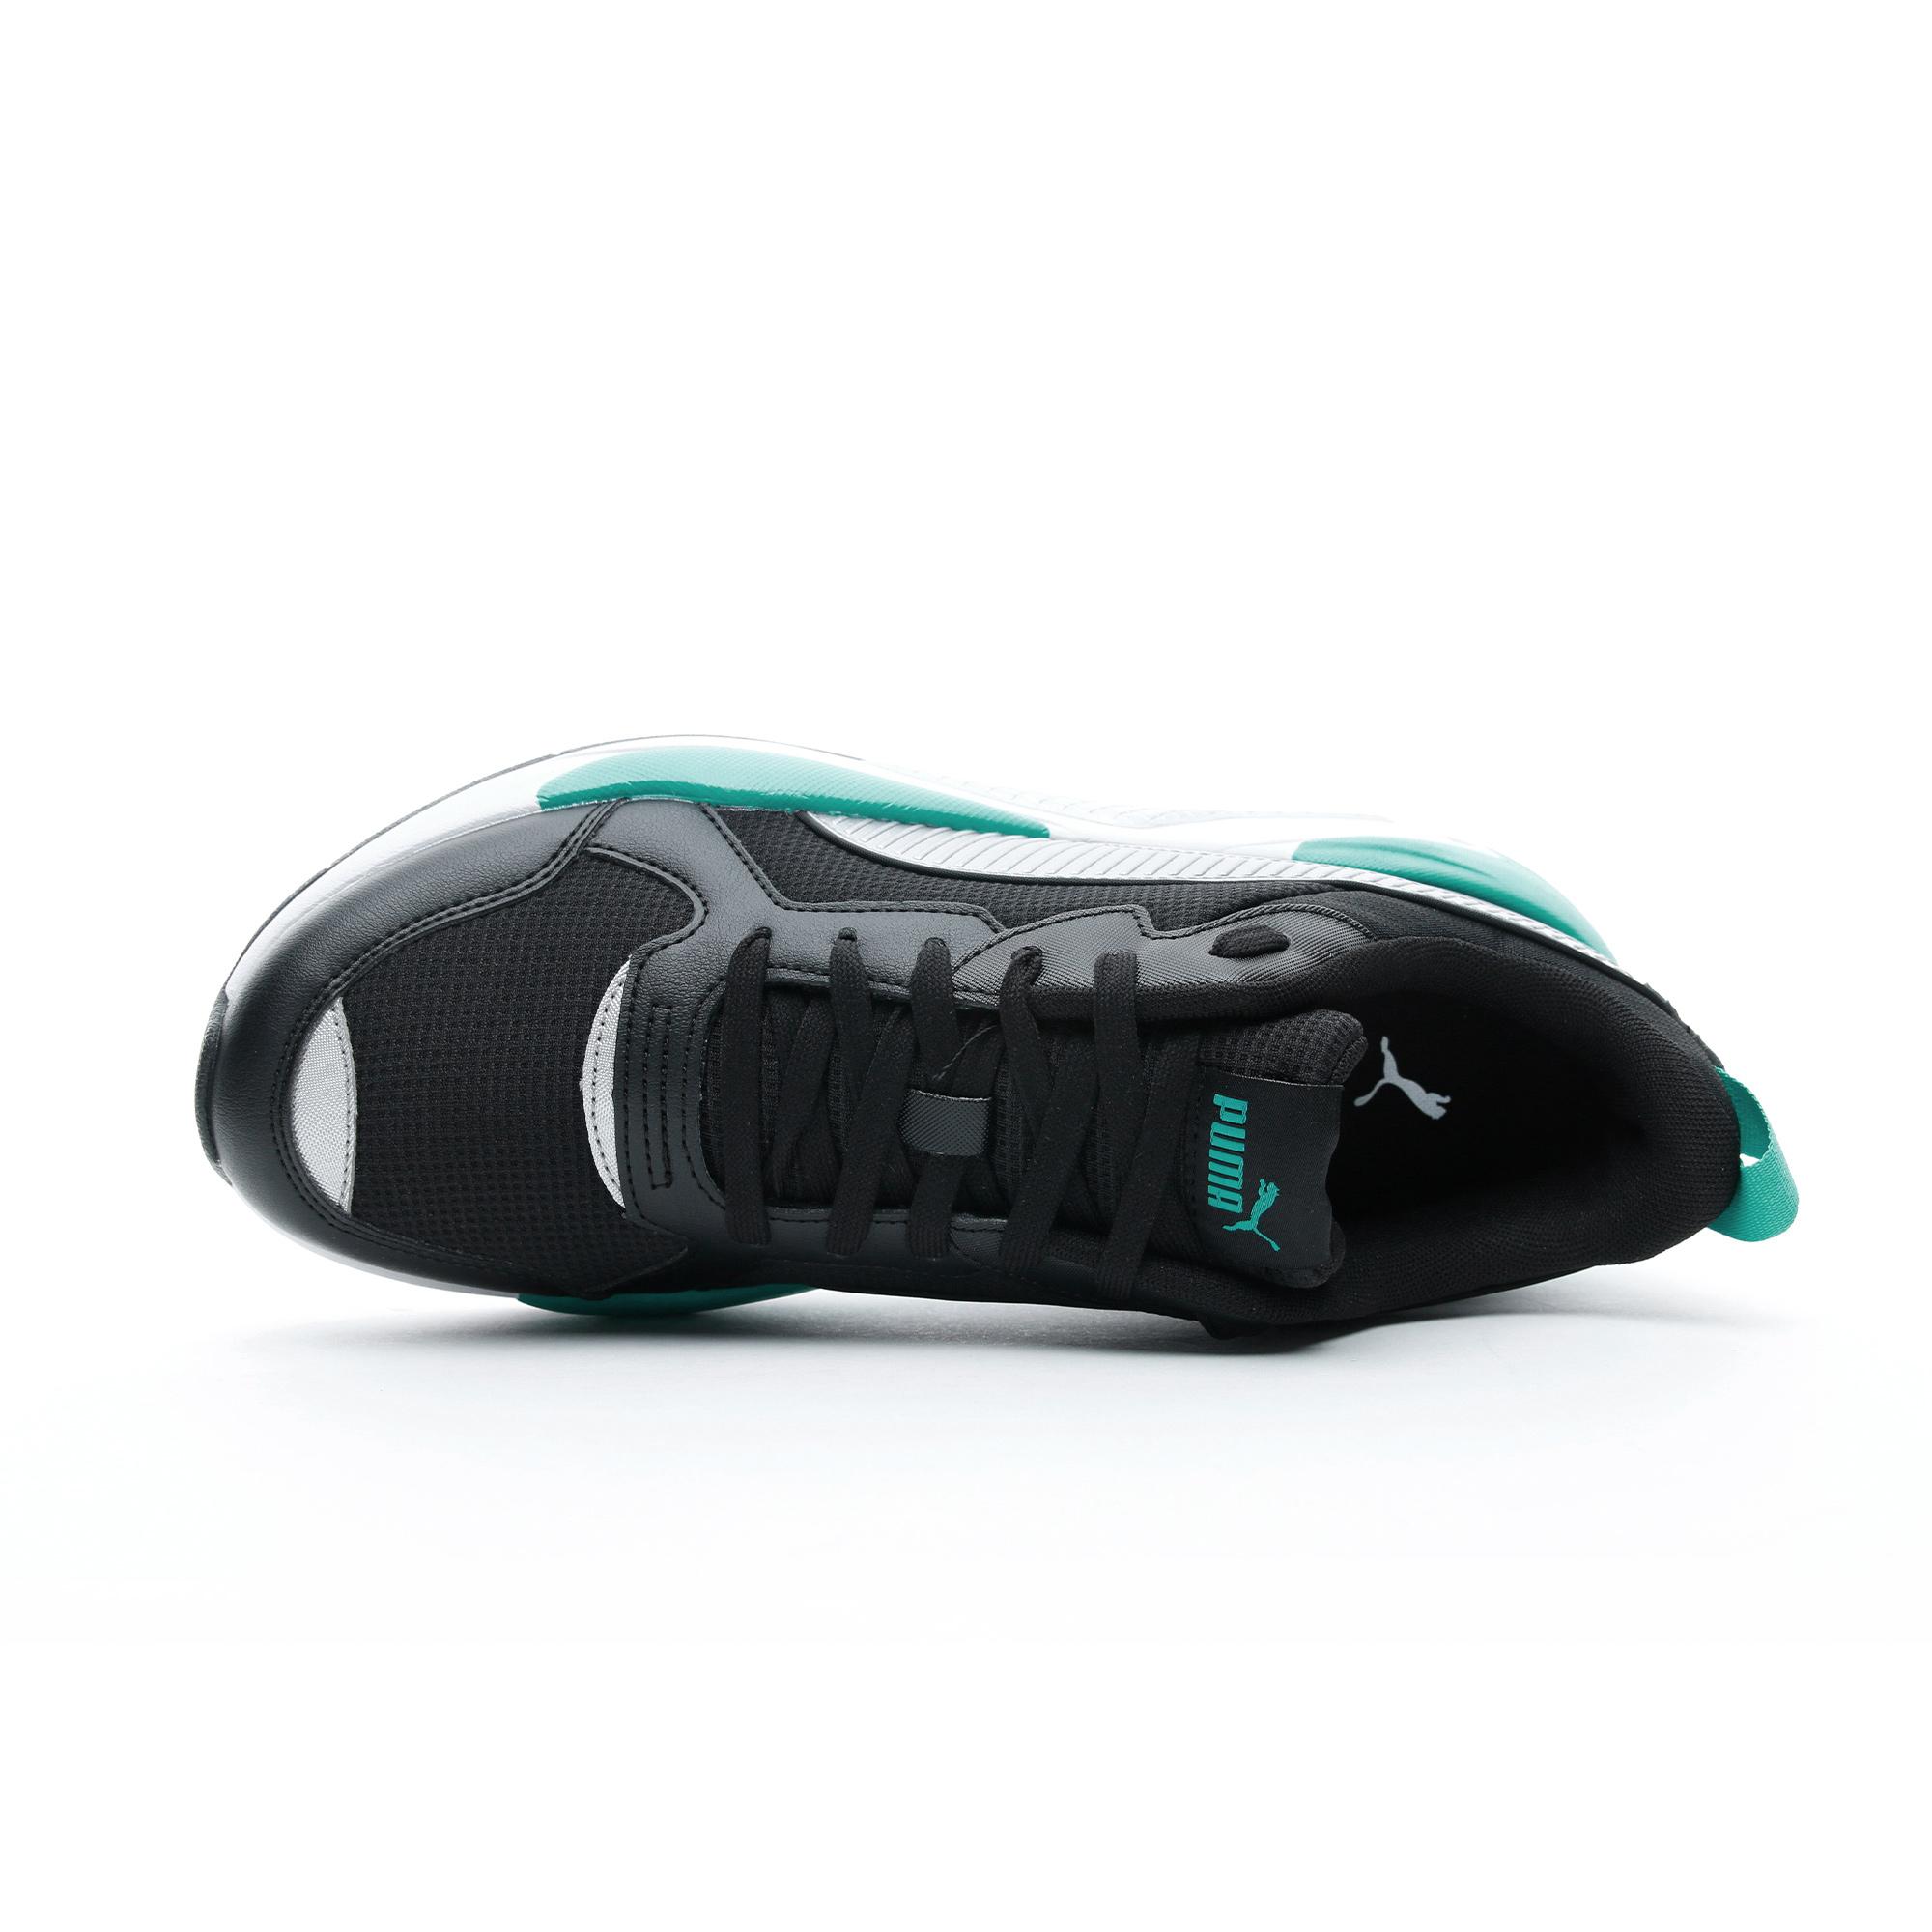 Puma Mercedes APM X-Ray Erkek Siyah Spor Ayakkabı